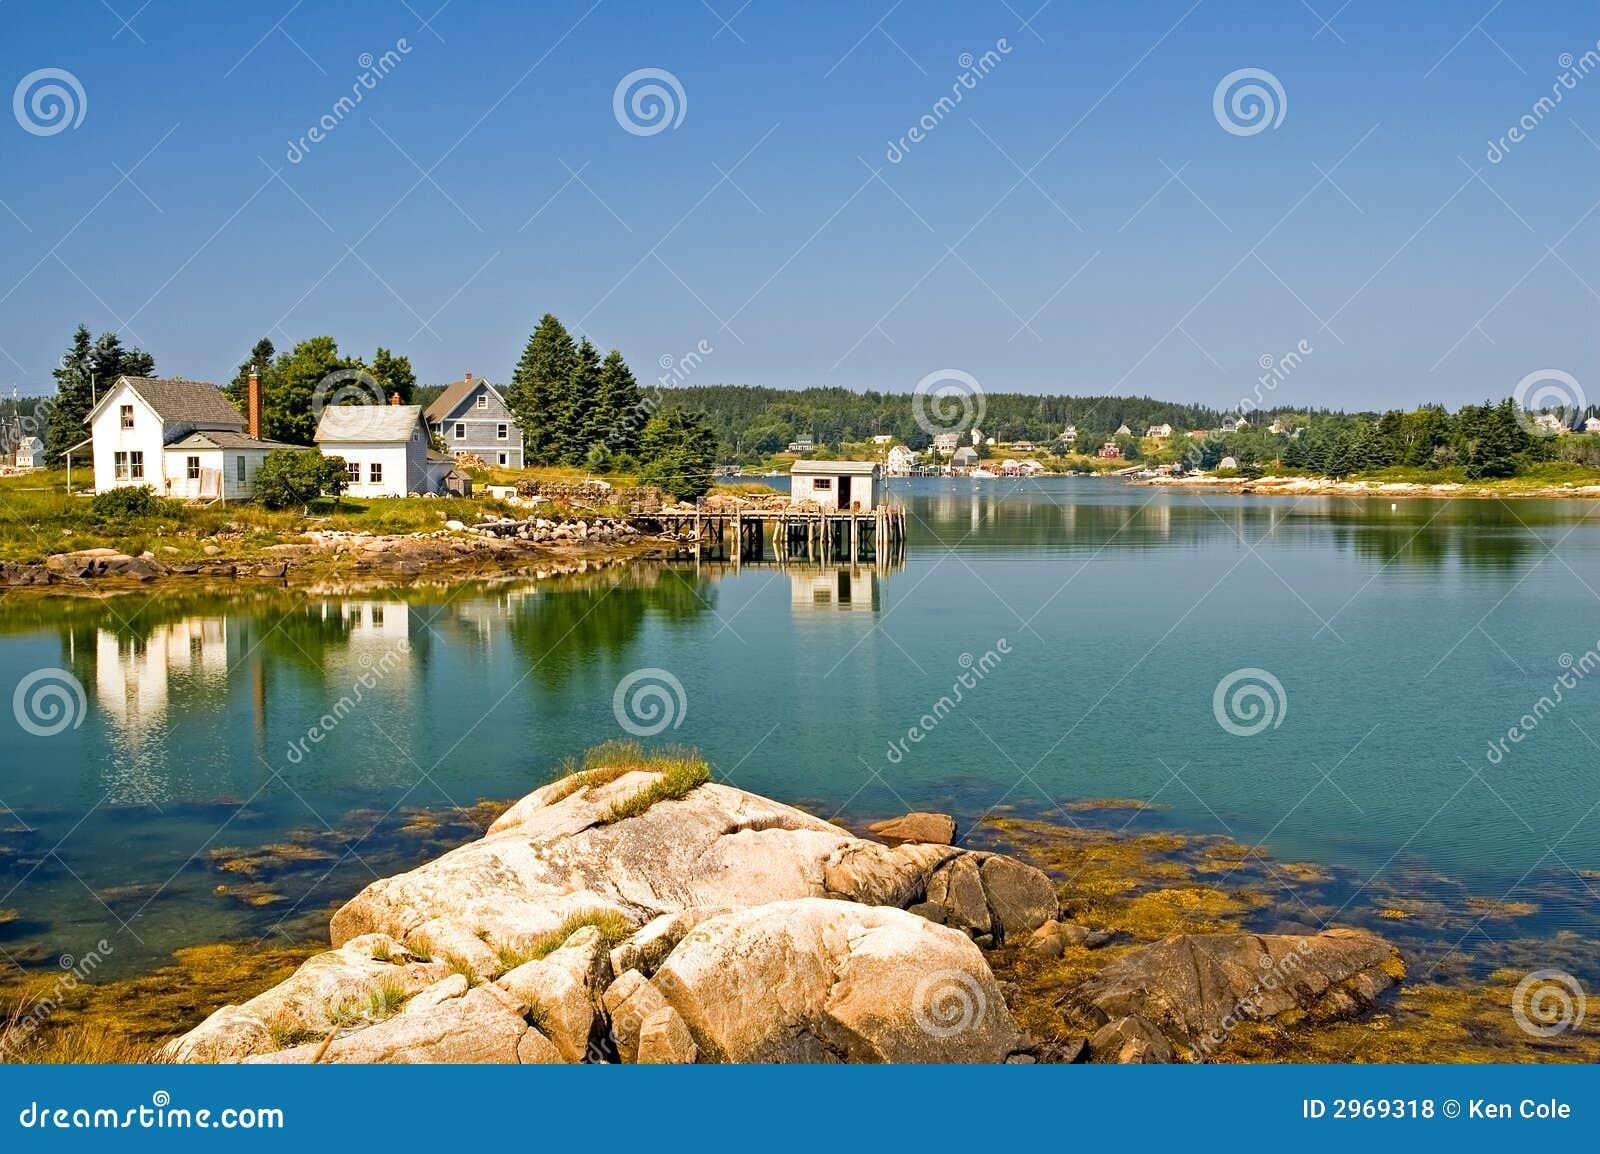 Scenic maine fishing village royalty free stock photos for Fishing docks near me